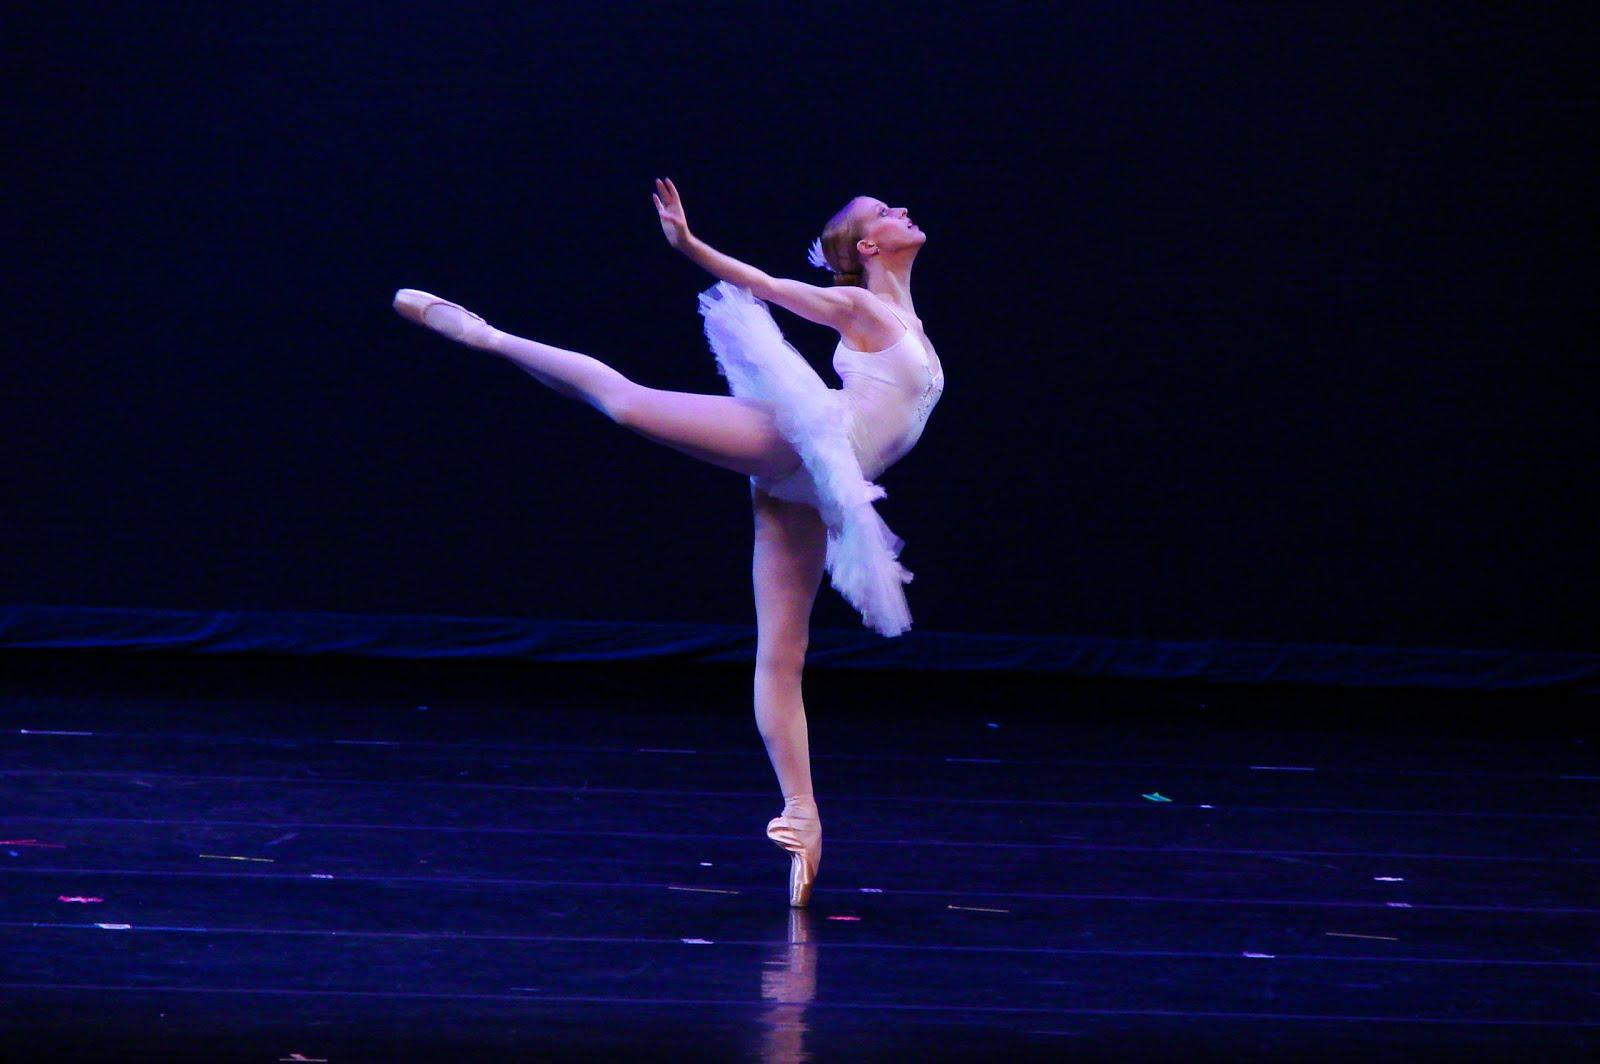 classical ballet dancers